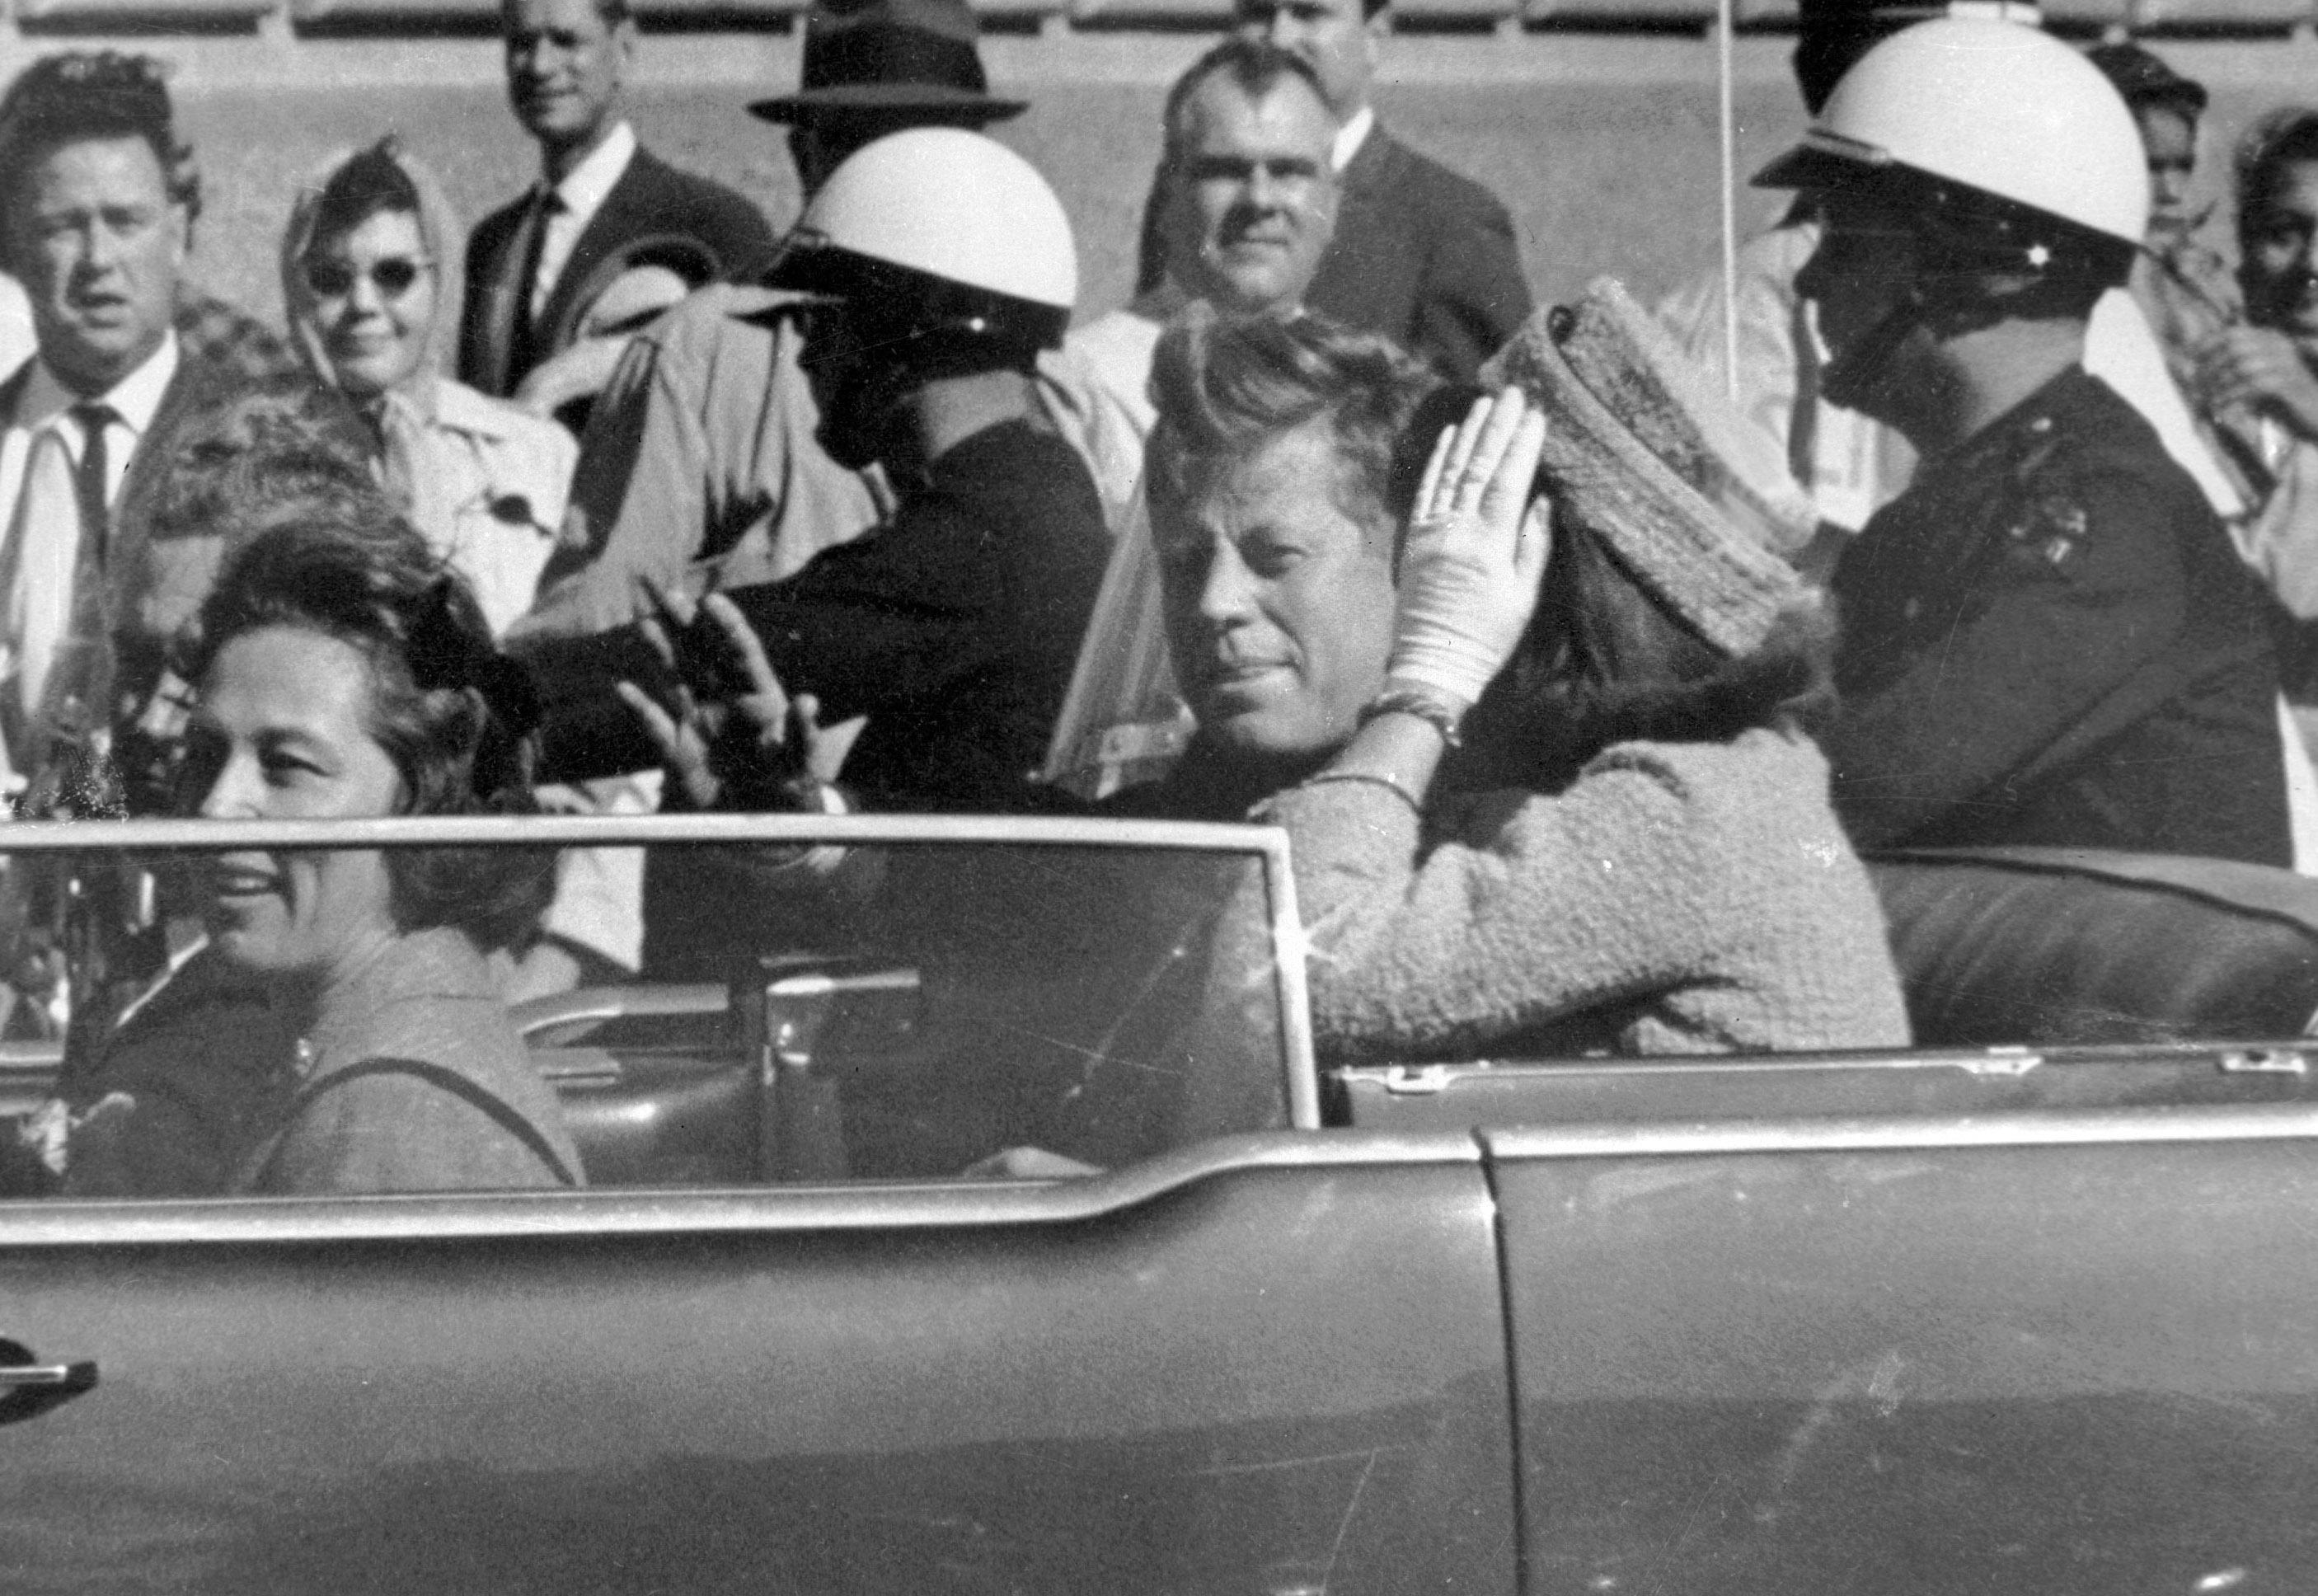 John Kennedy limousine goes under the hammer